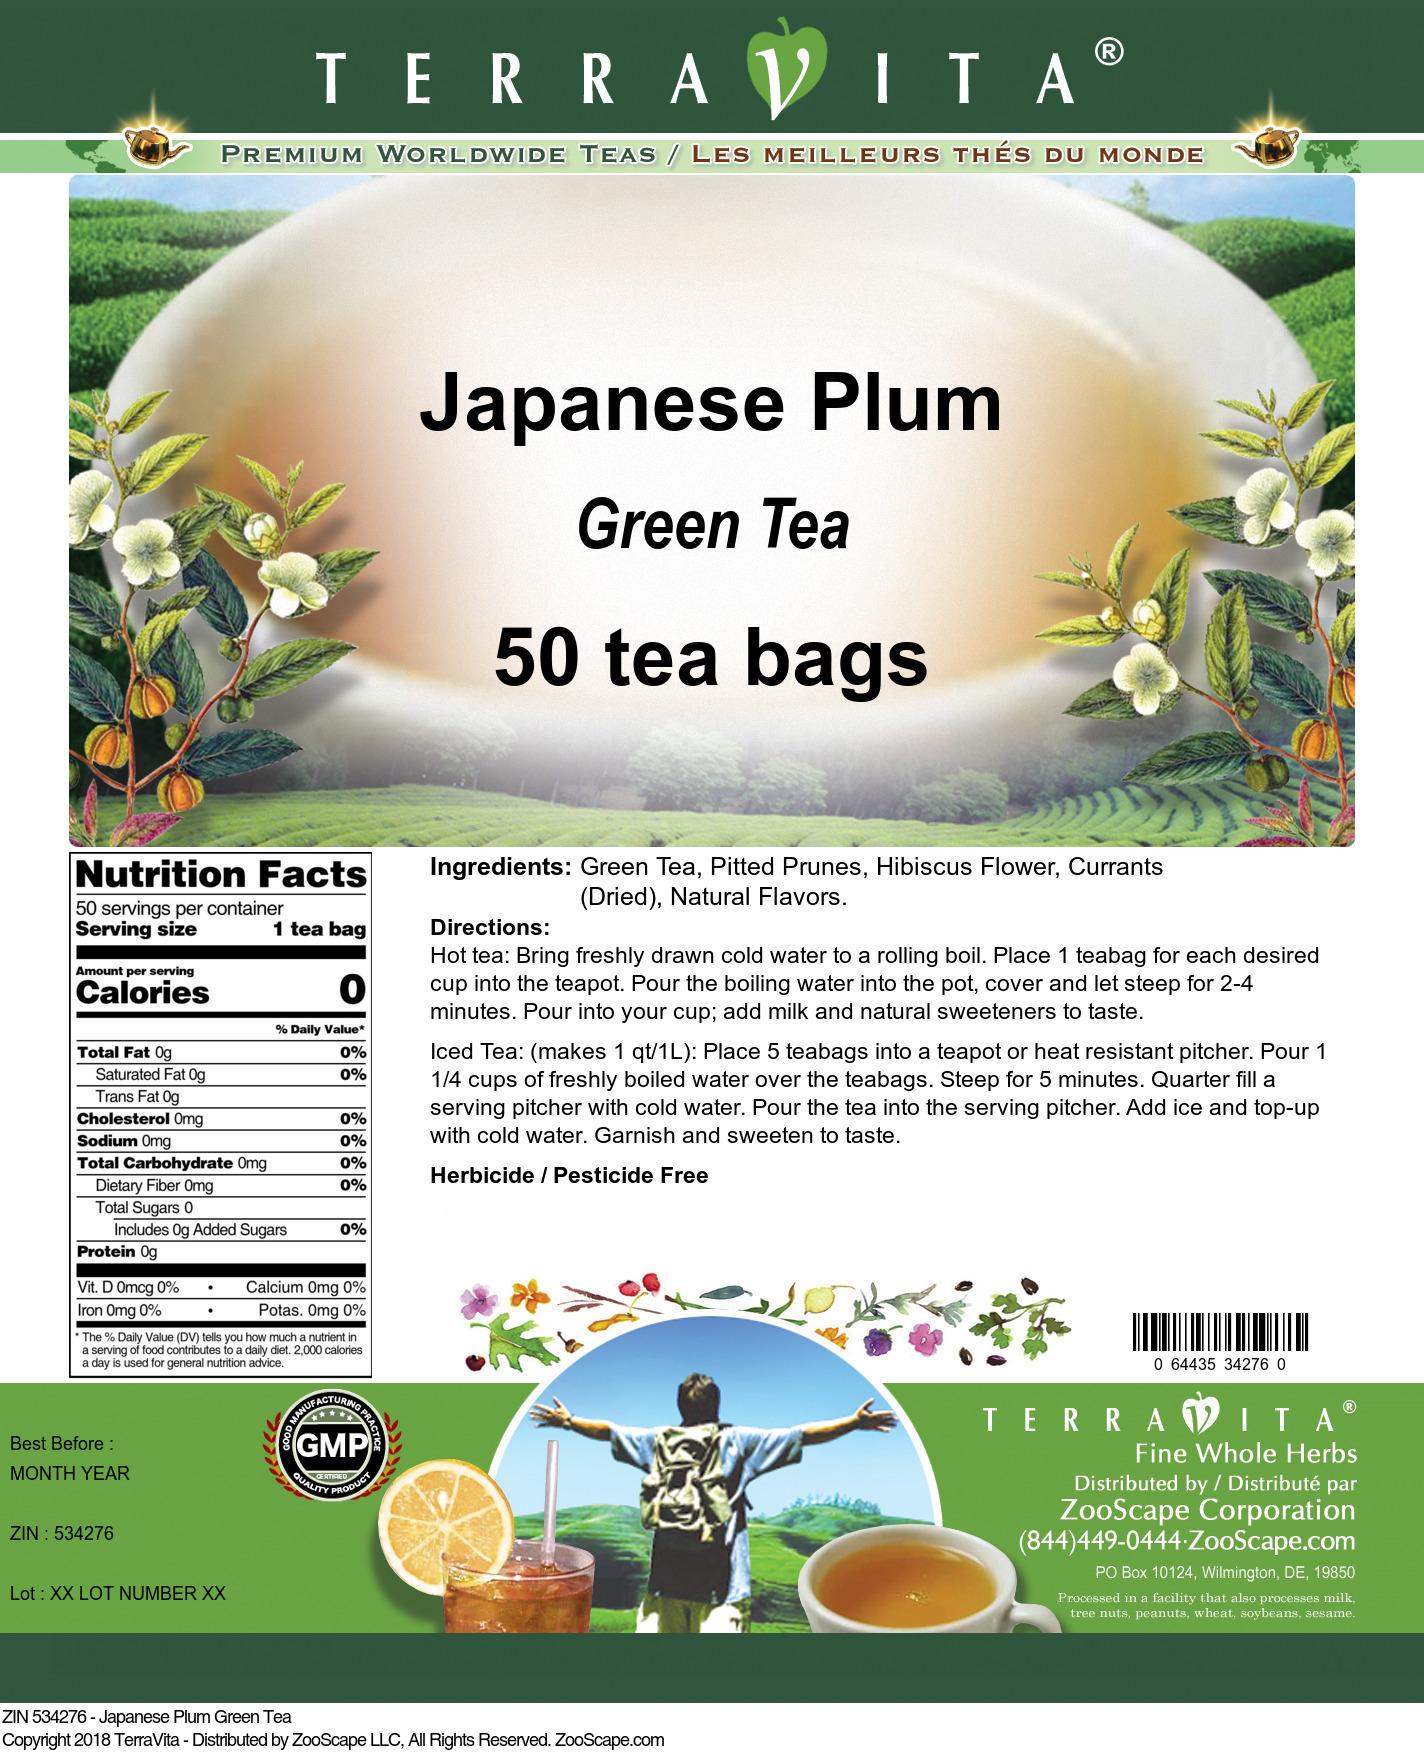 Japanese Plum Green Tea